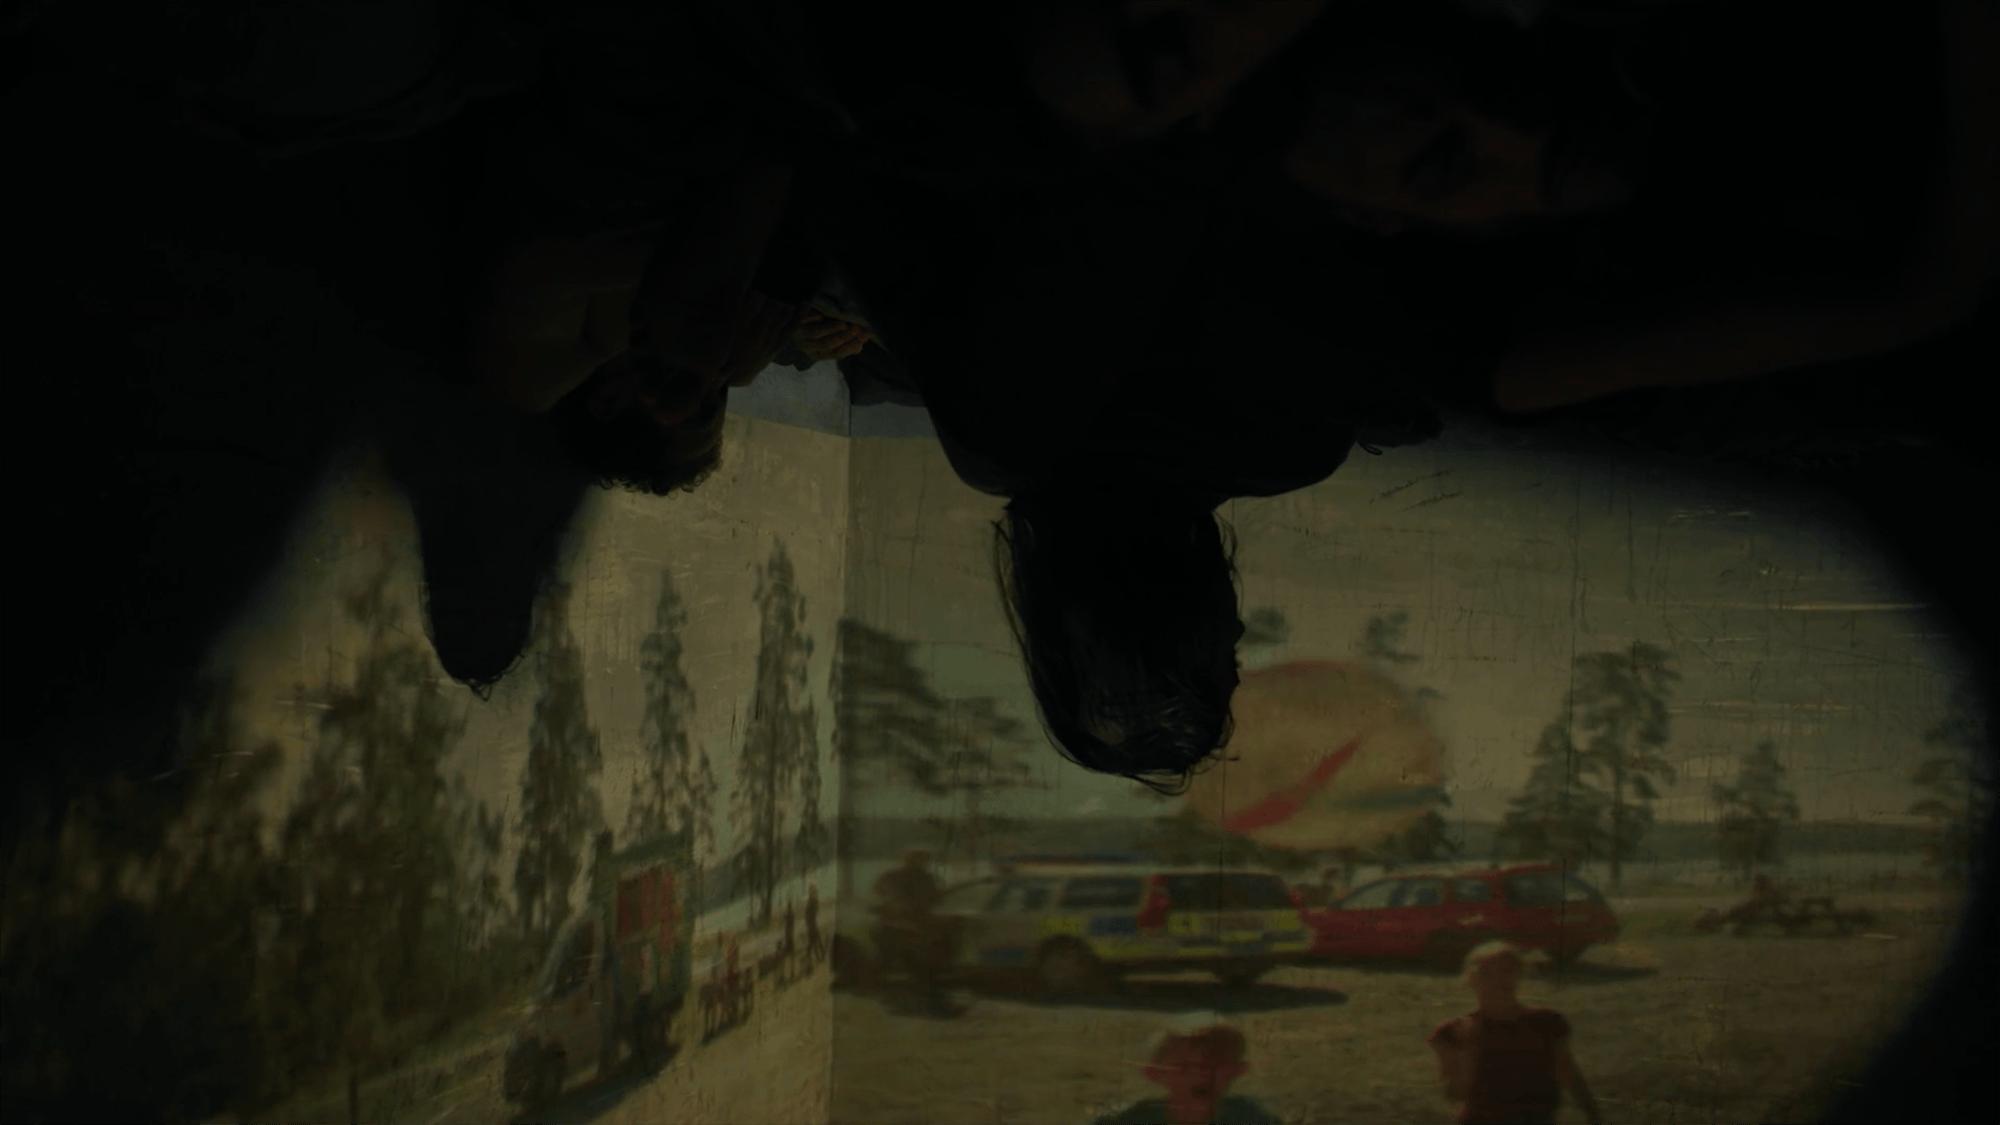 Dark chamber center